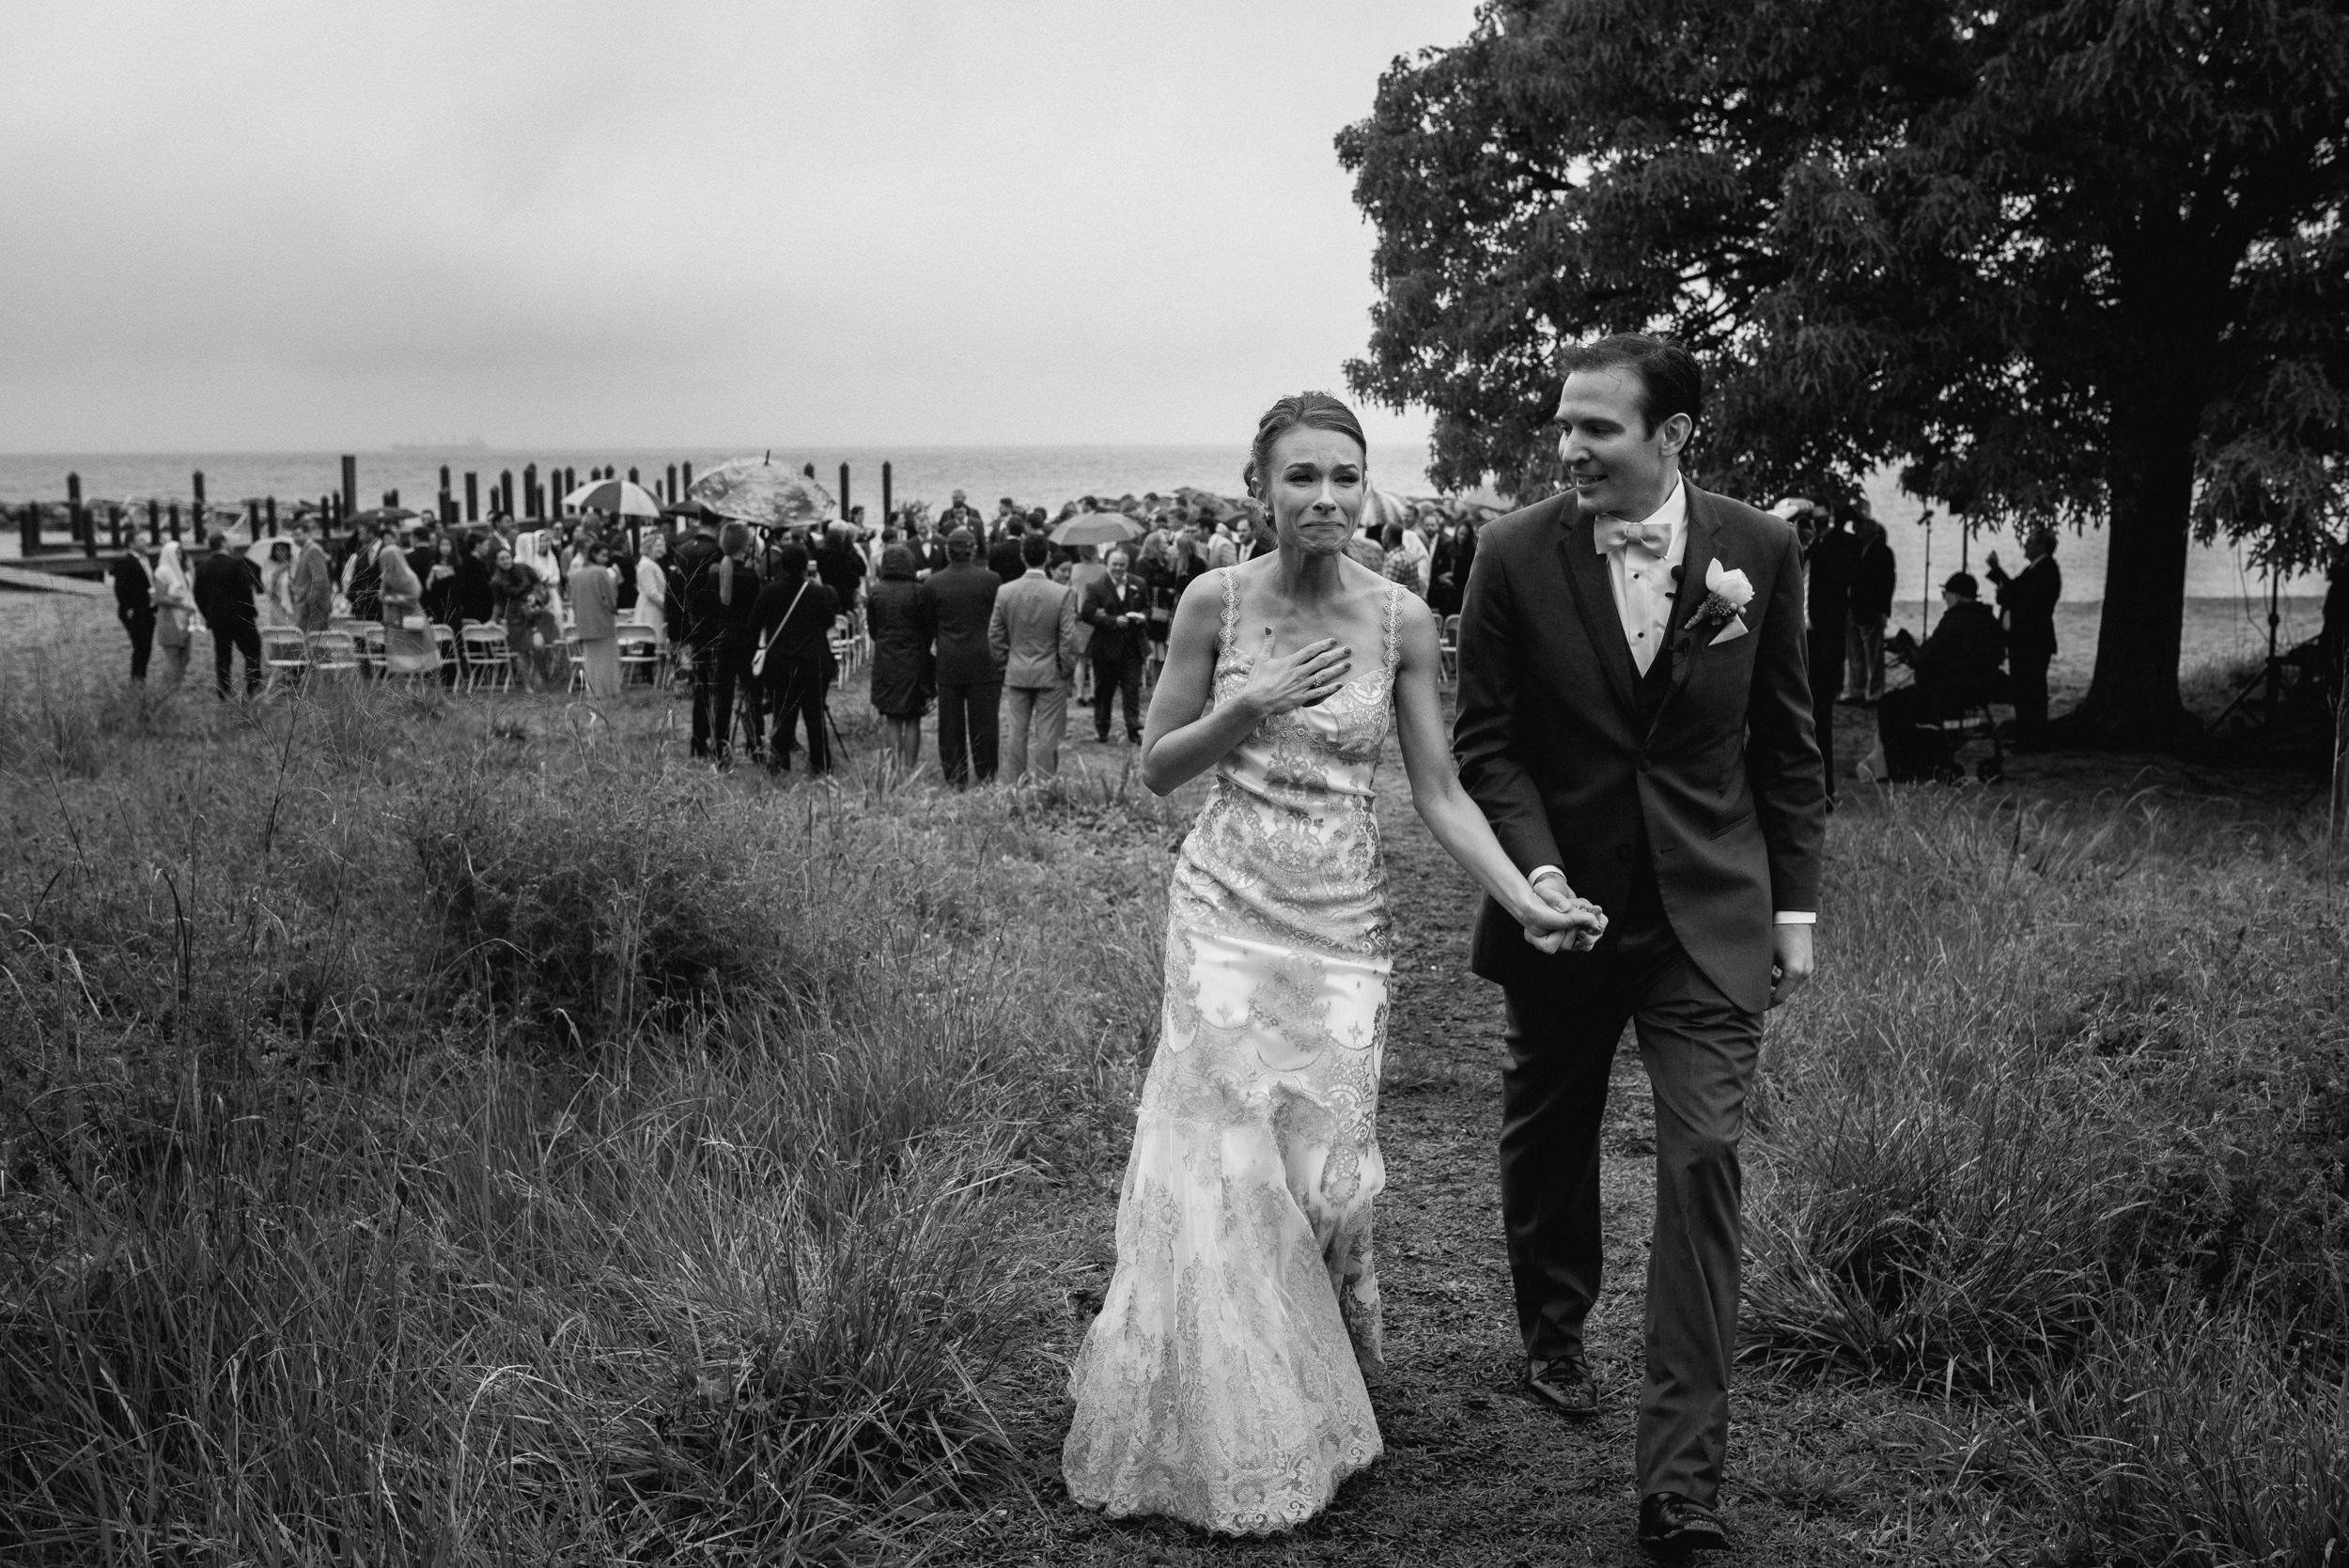 Philip Merrill Environmental Center wedding-16.jpg